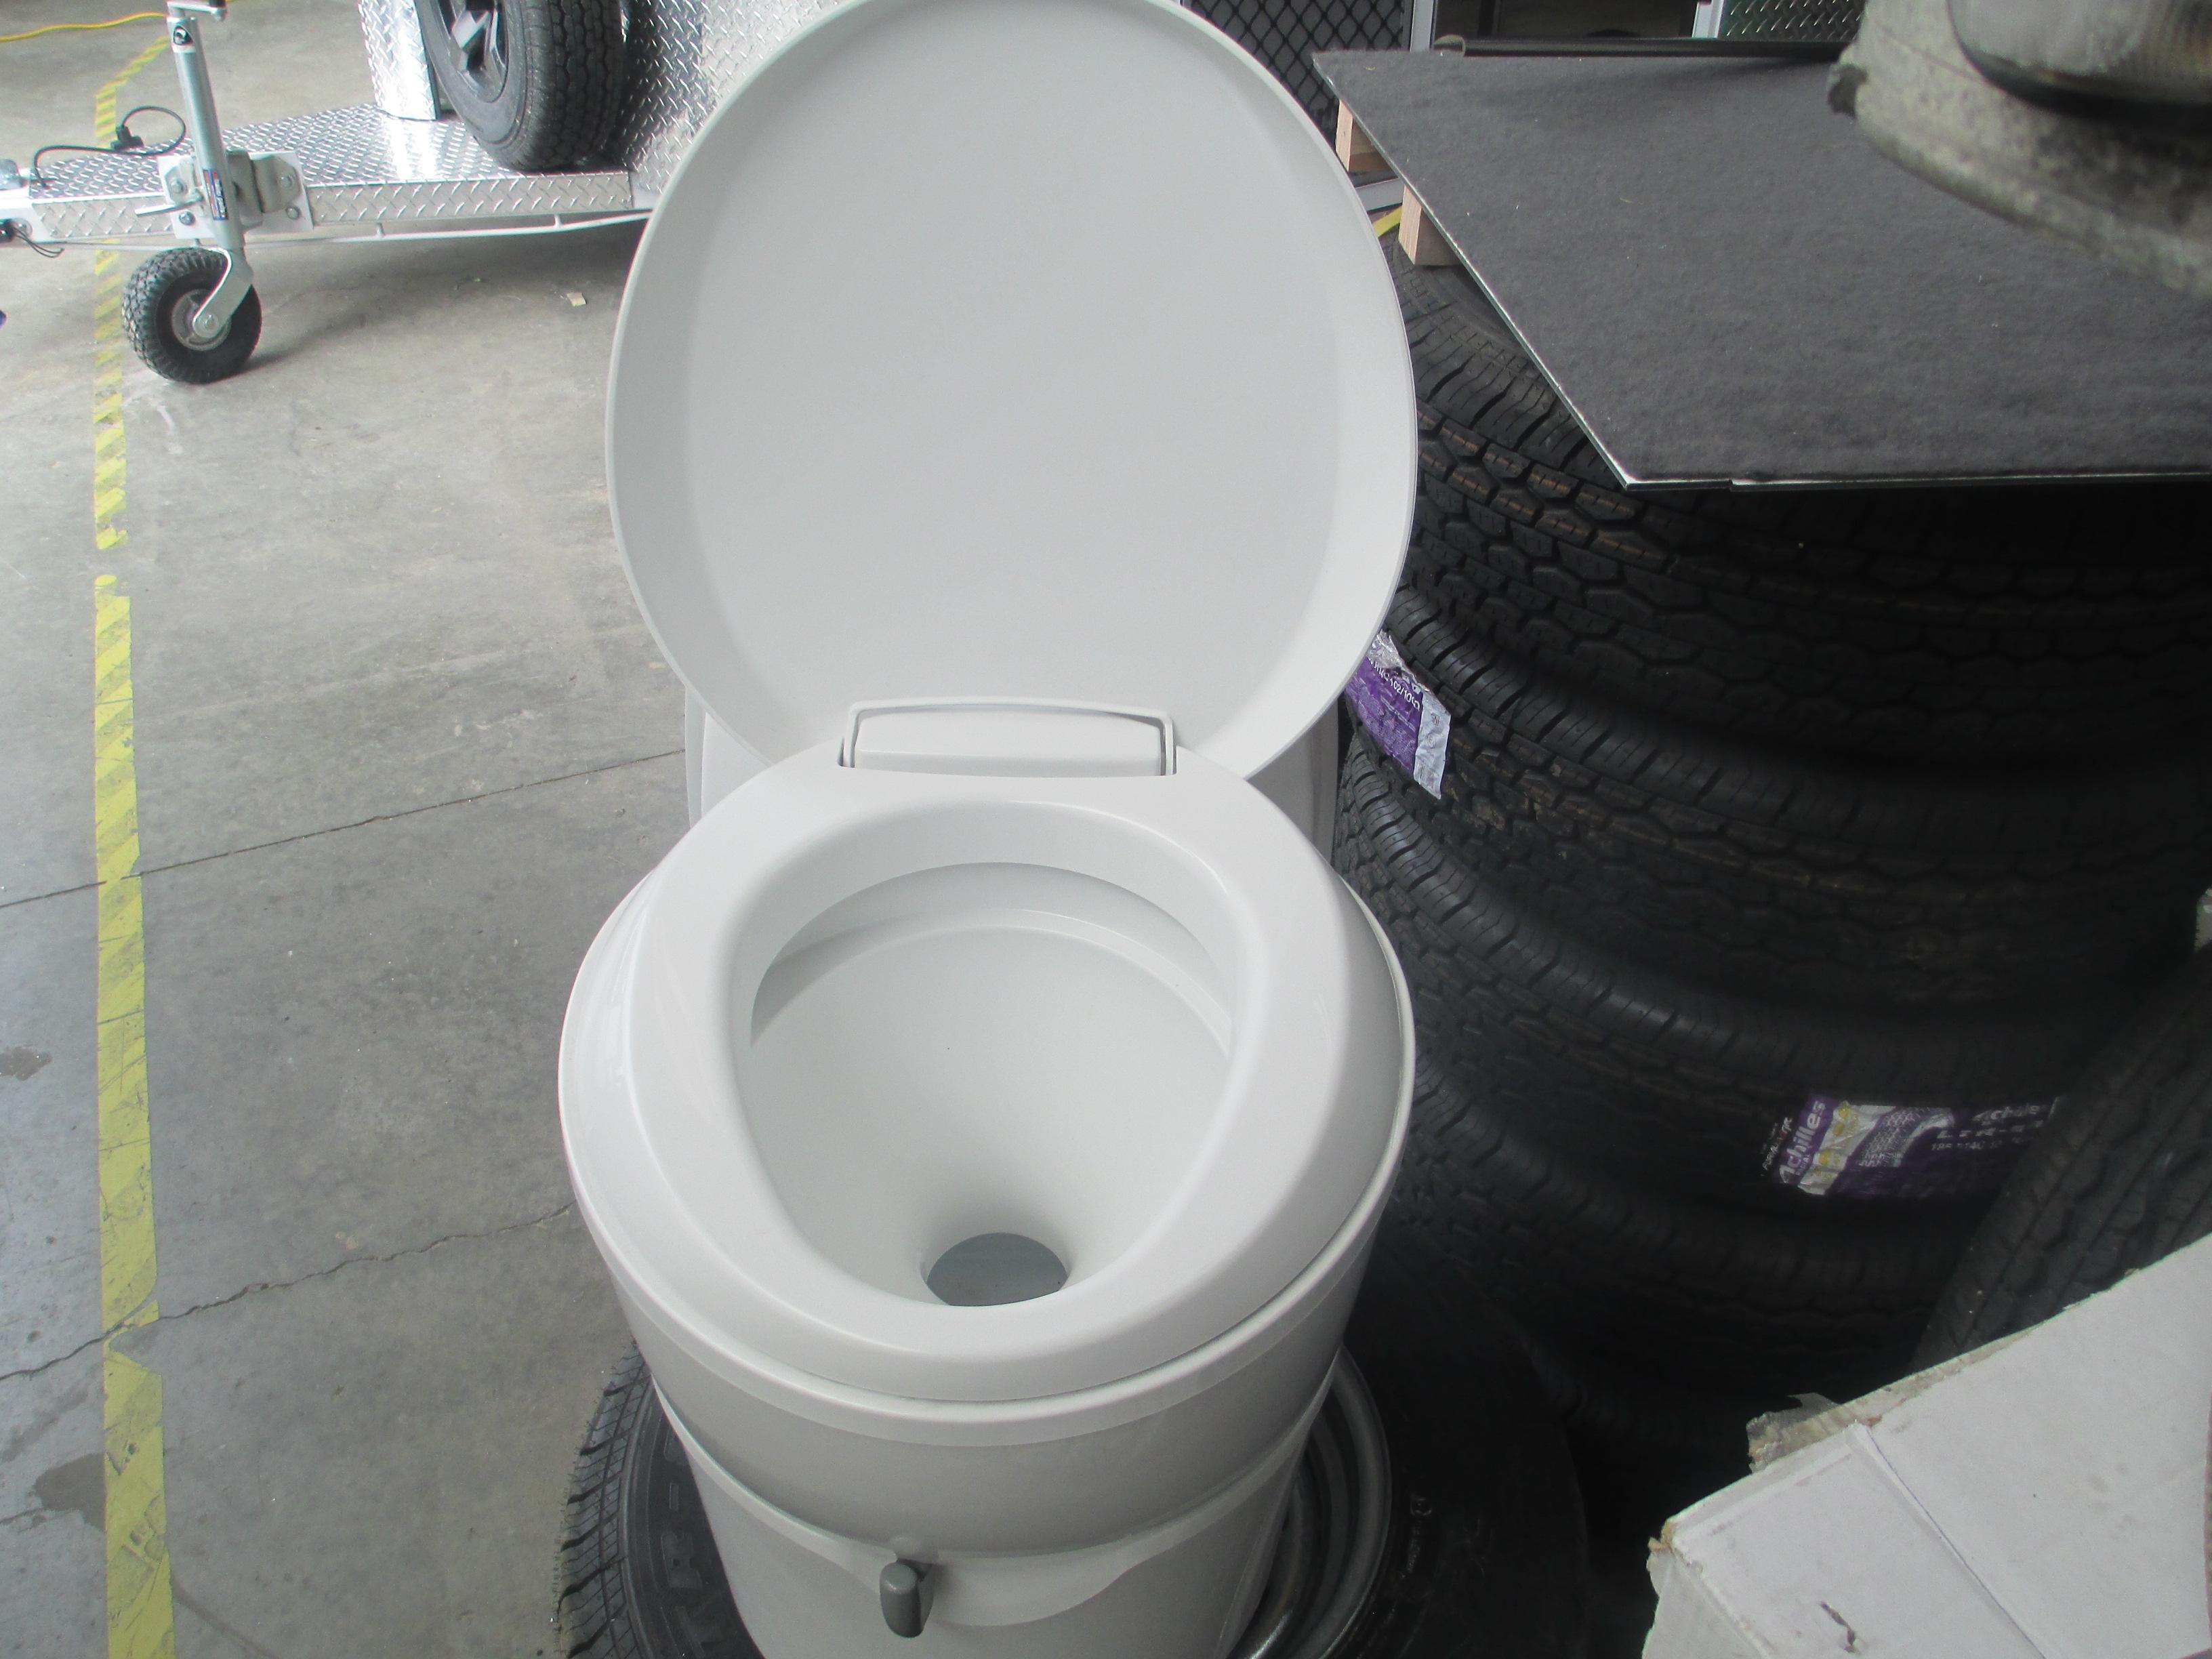 Thetford C223CS Swivel Toilet with access door included